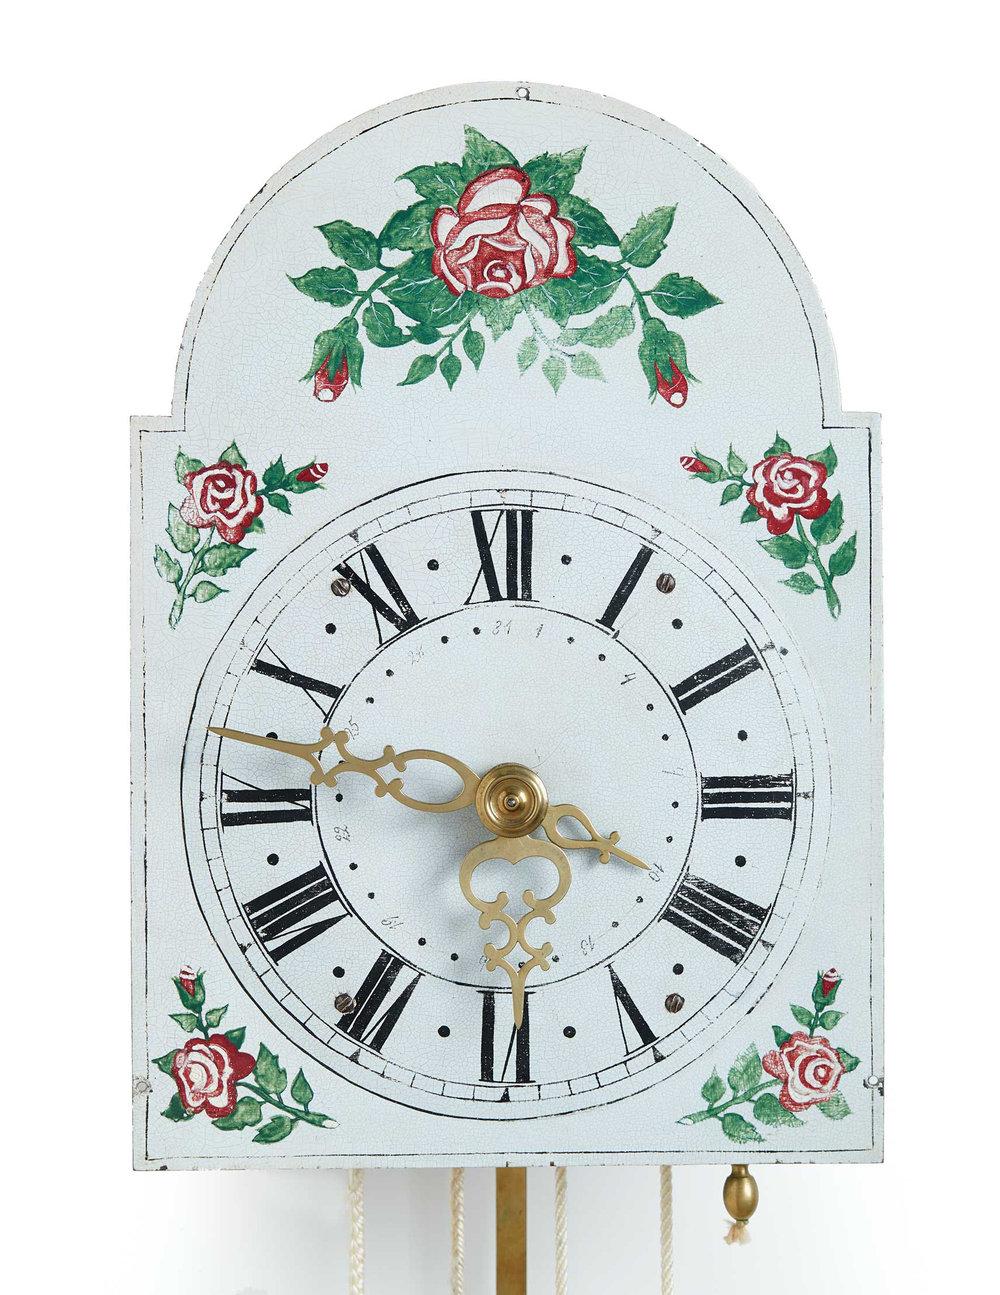 Hildebrand Clock no. 334, 1871. Mennonite Heritage Village 2013.8.1 (MC0223)